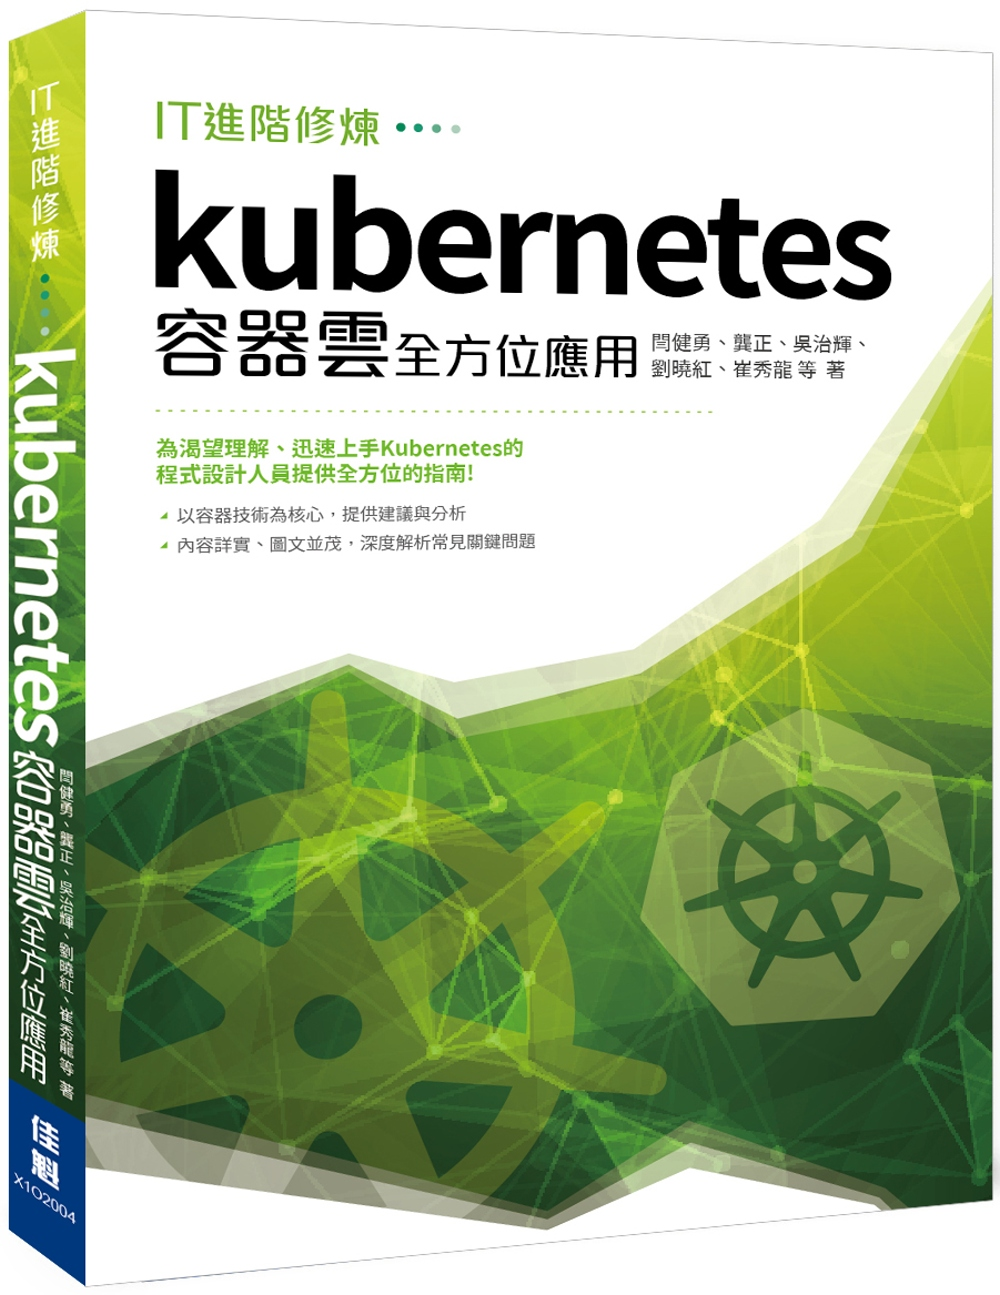 IT進階修煉:Kubernetes容器雲全方位應用